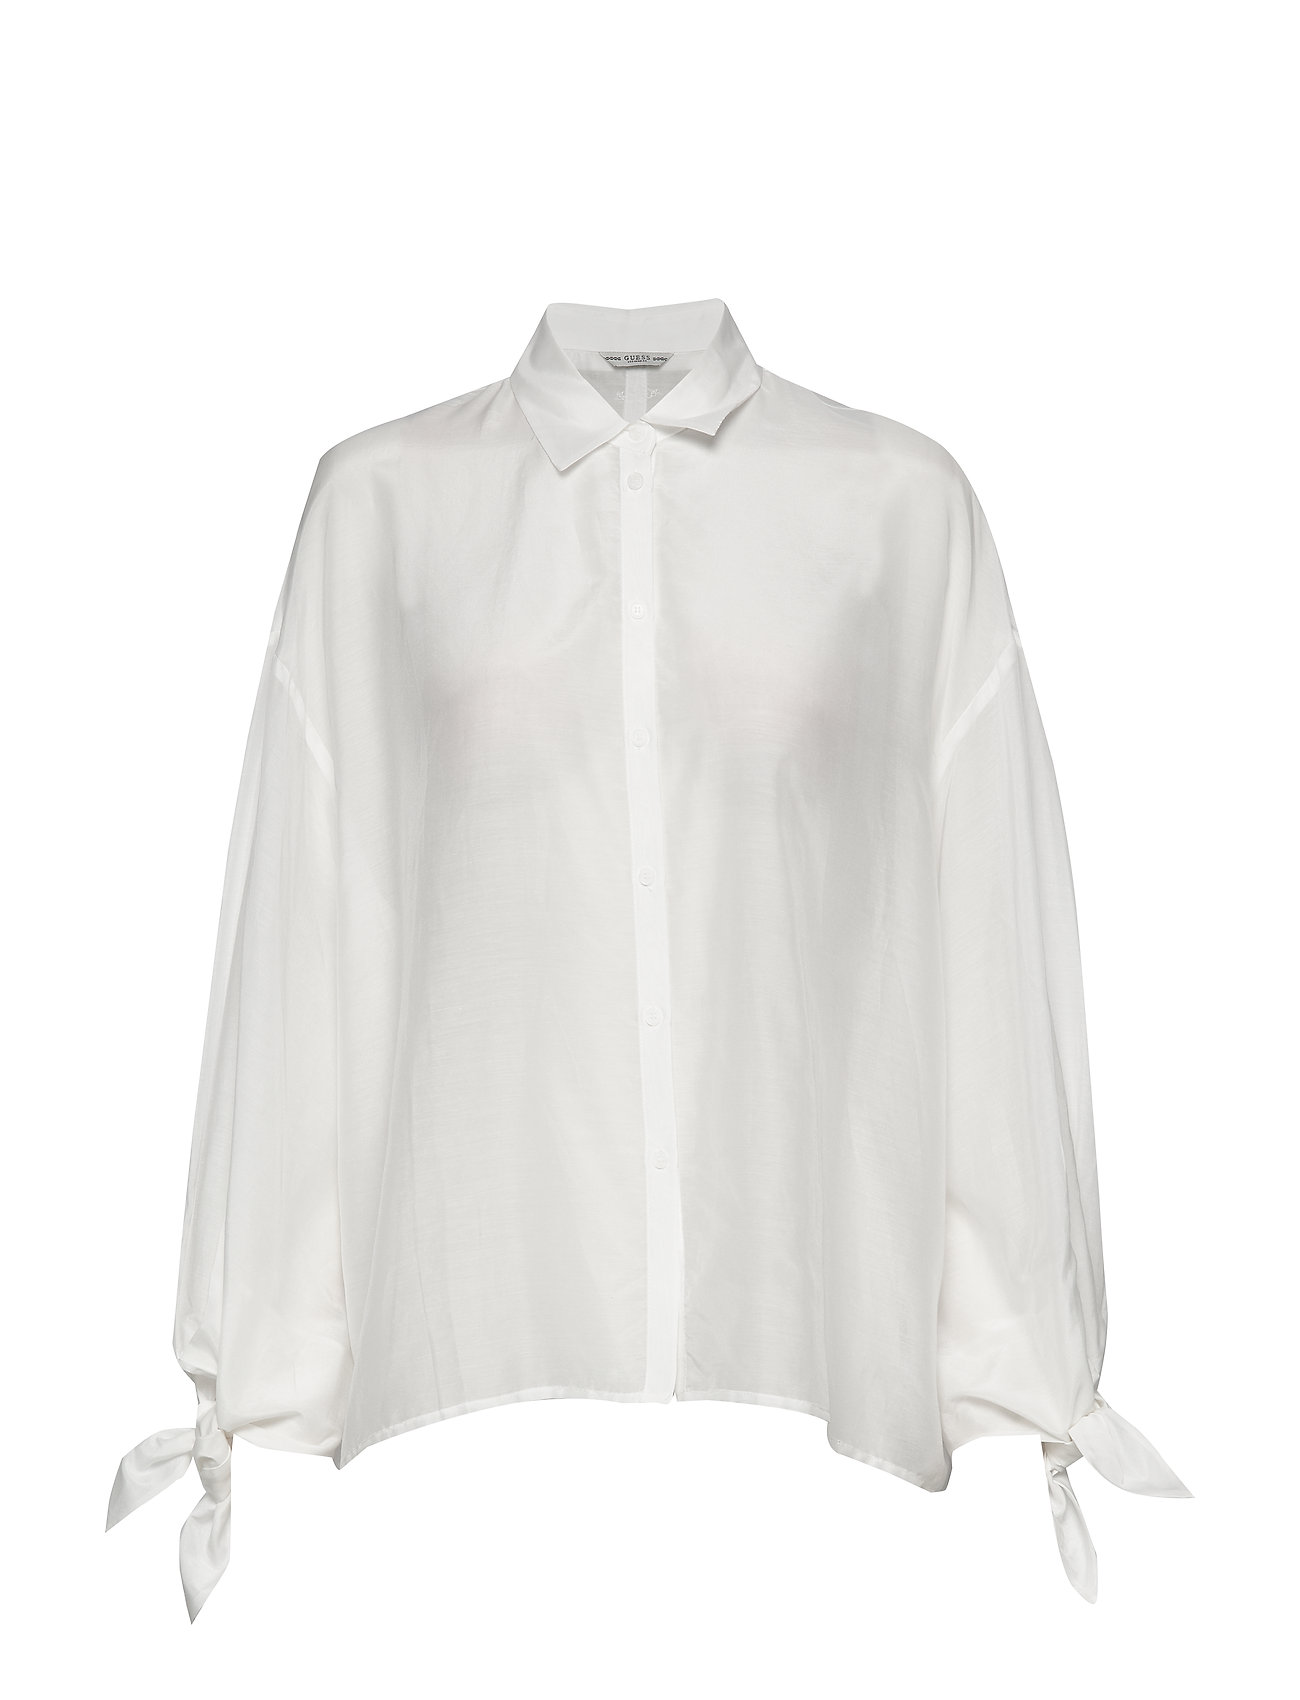 GUESS Jeans LS MARISA SHIRT - TRUE WHITE A000